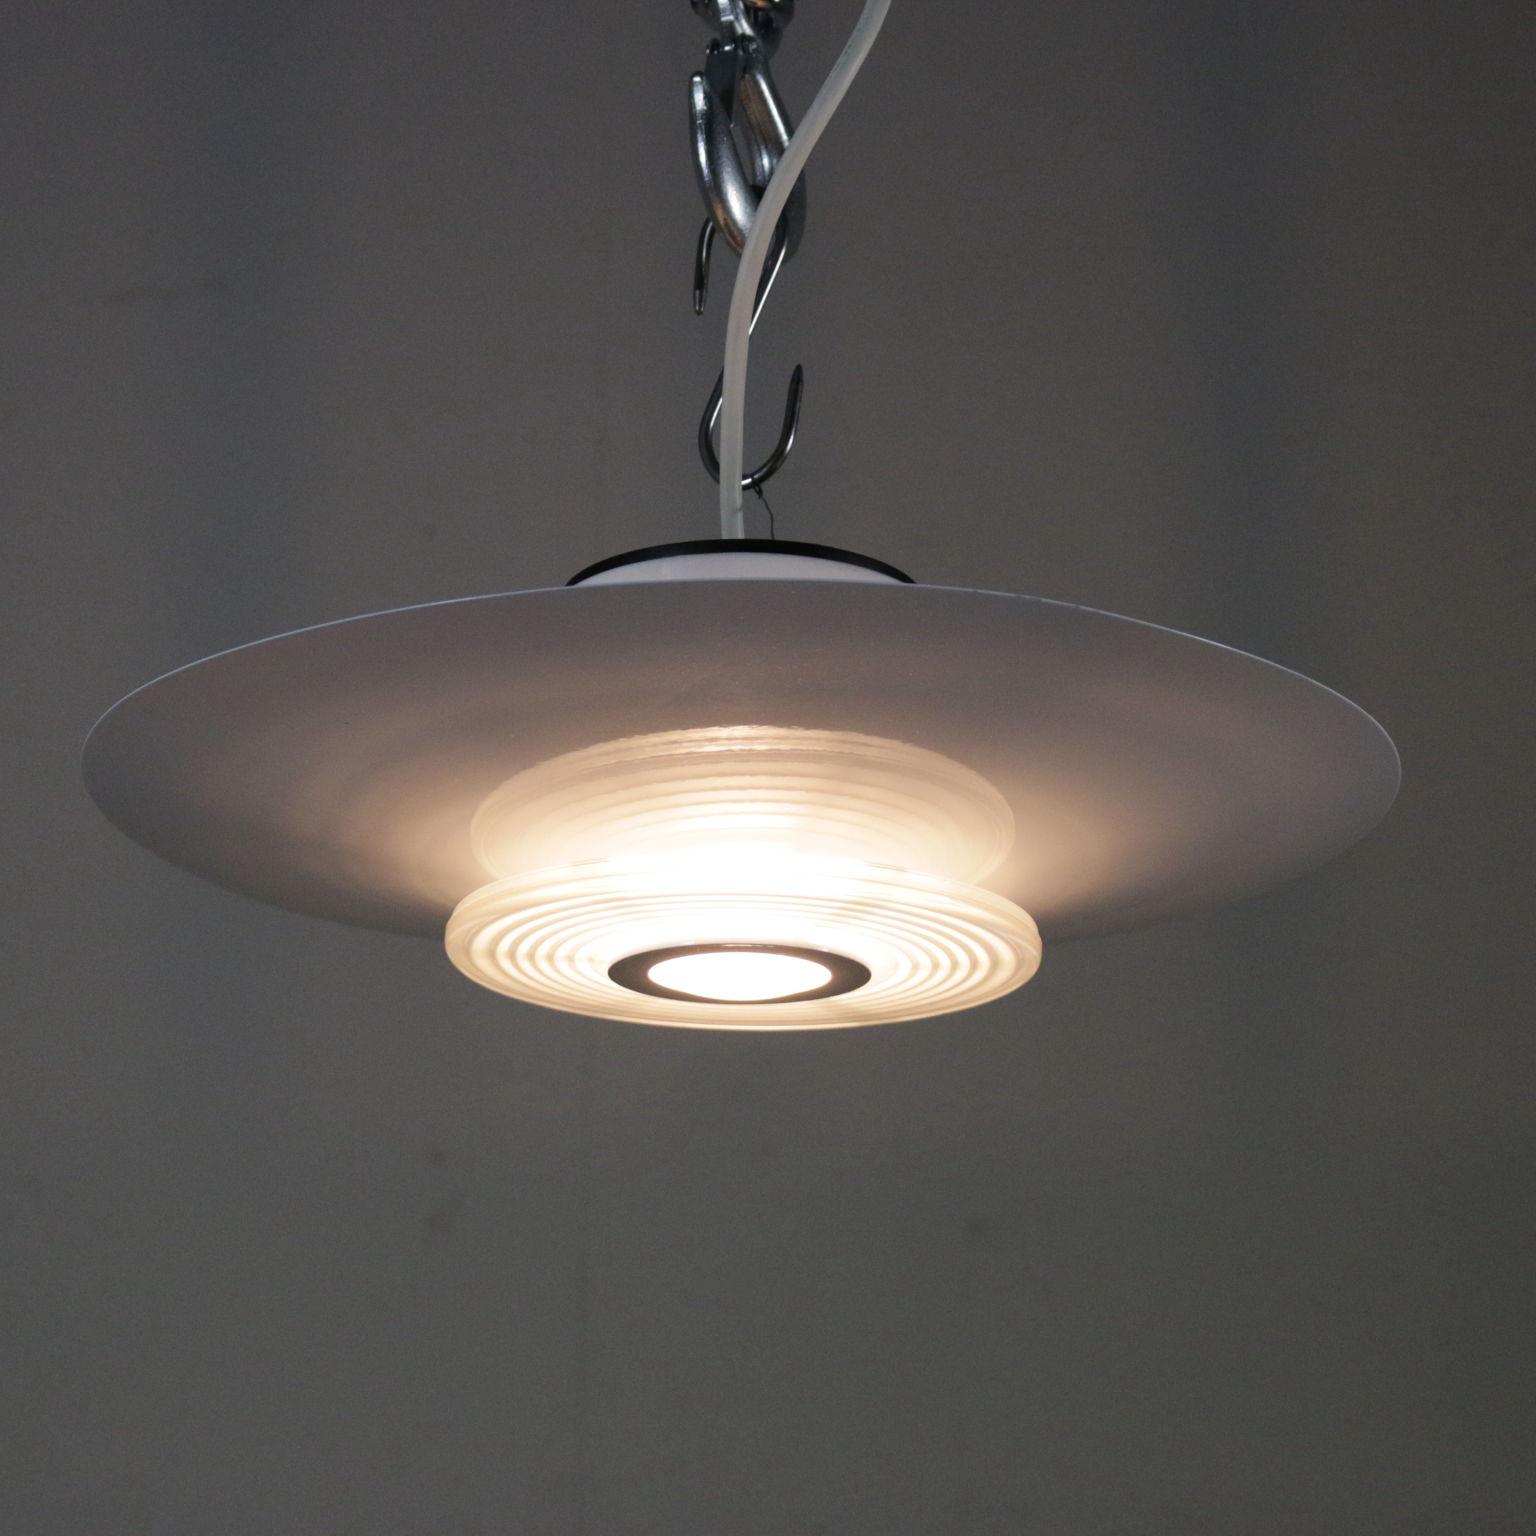 lustre flos flos arteluce gino sarfatti lights chandelier. Black Bedroom Furniture Sets. Home Design Ideas